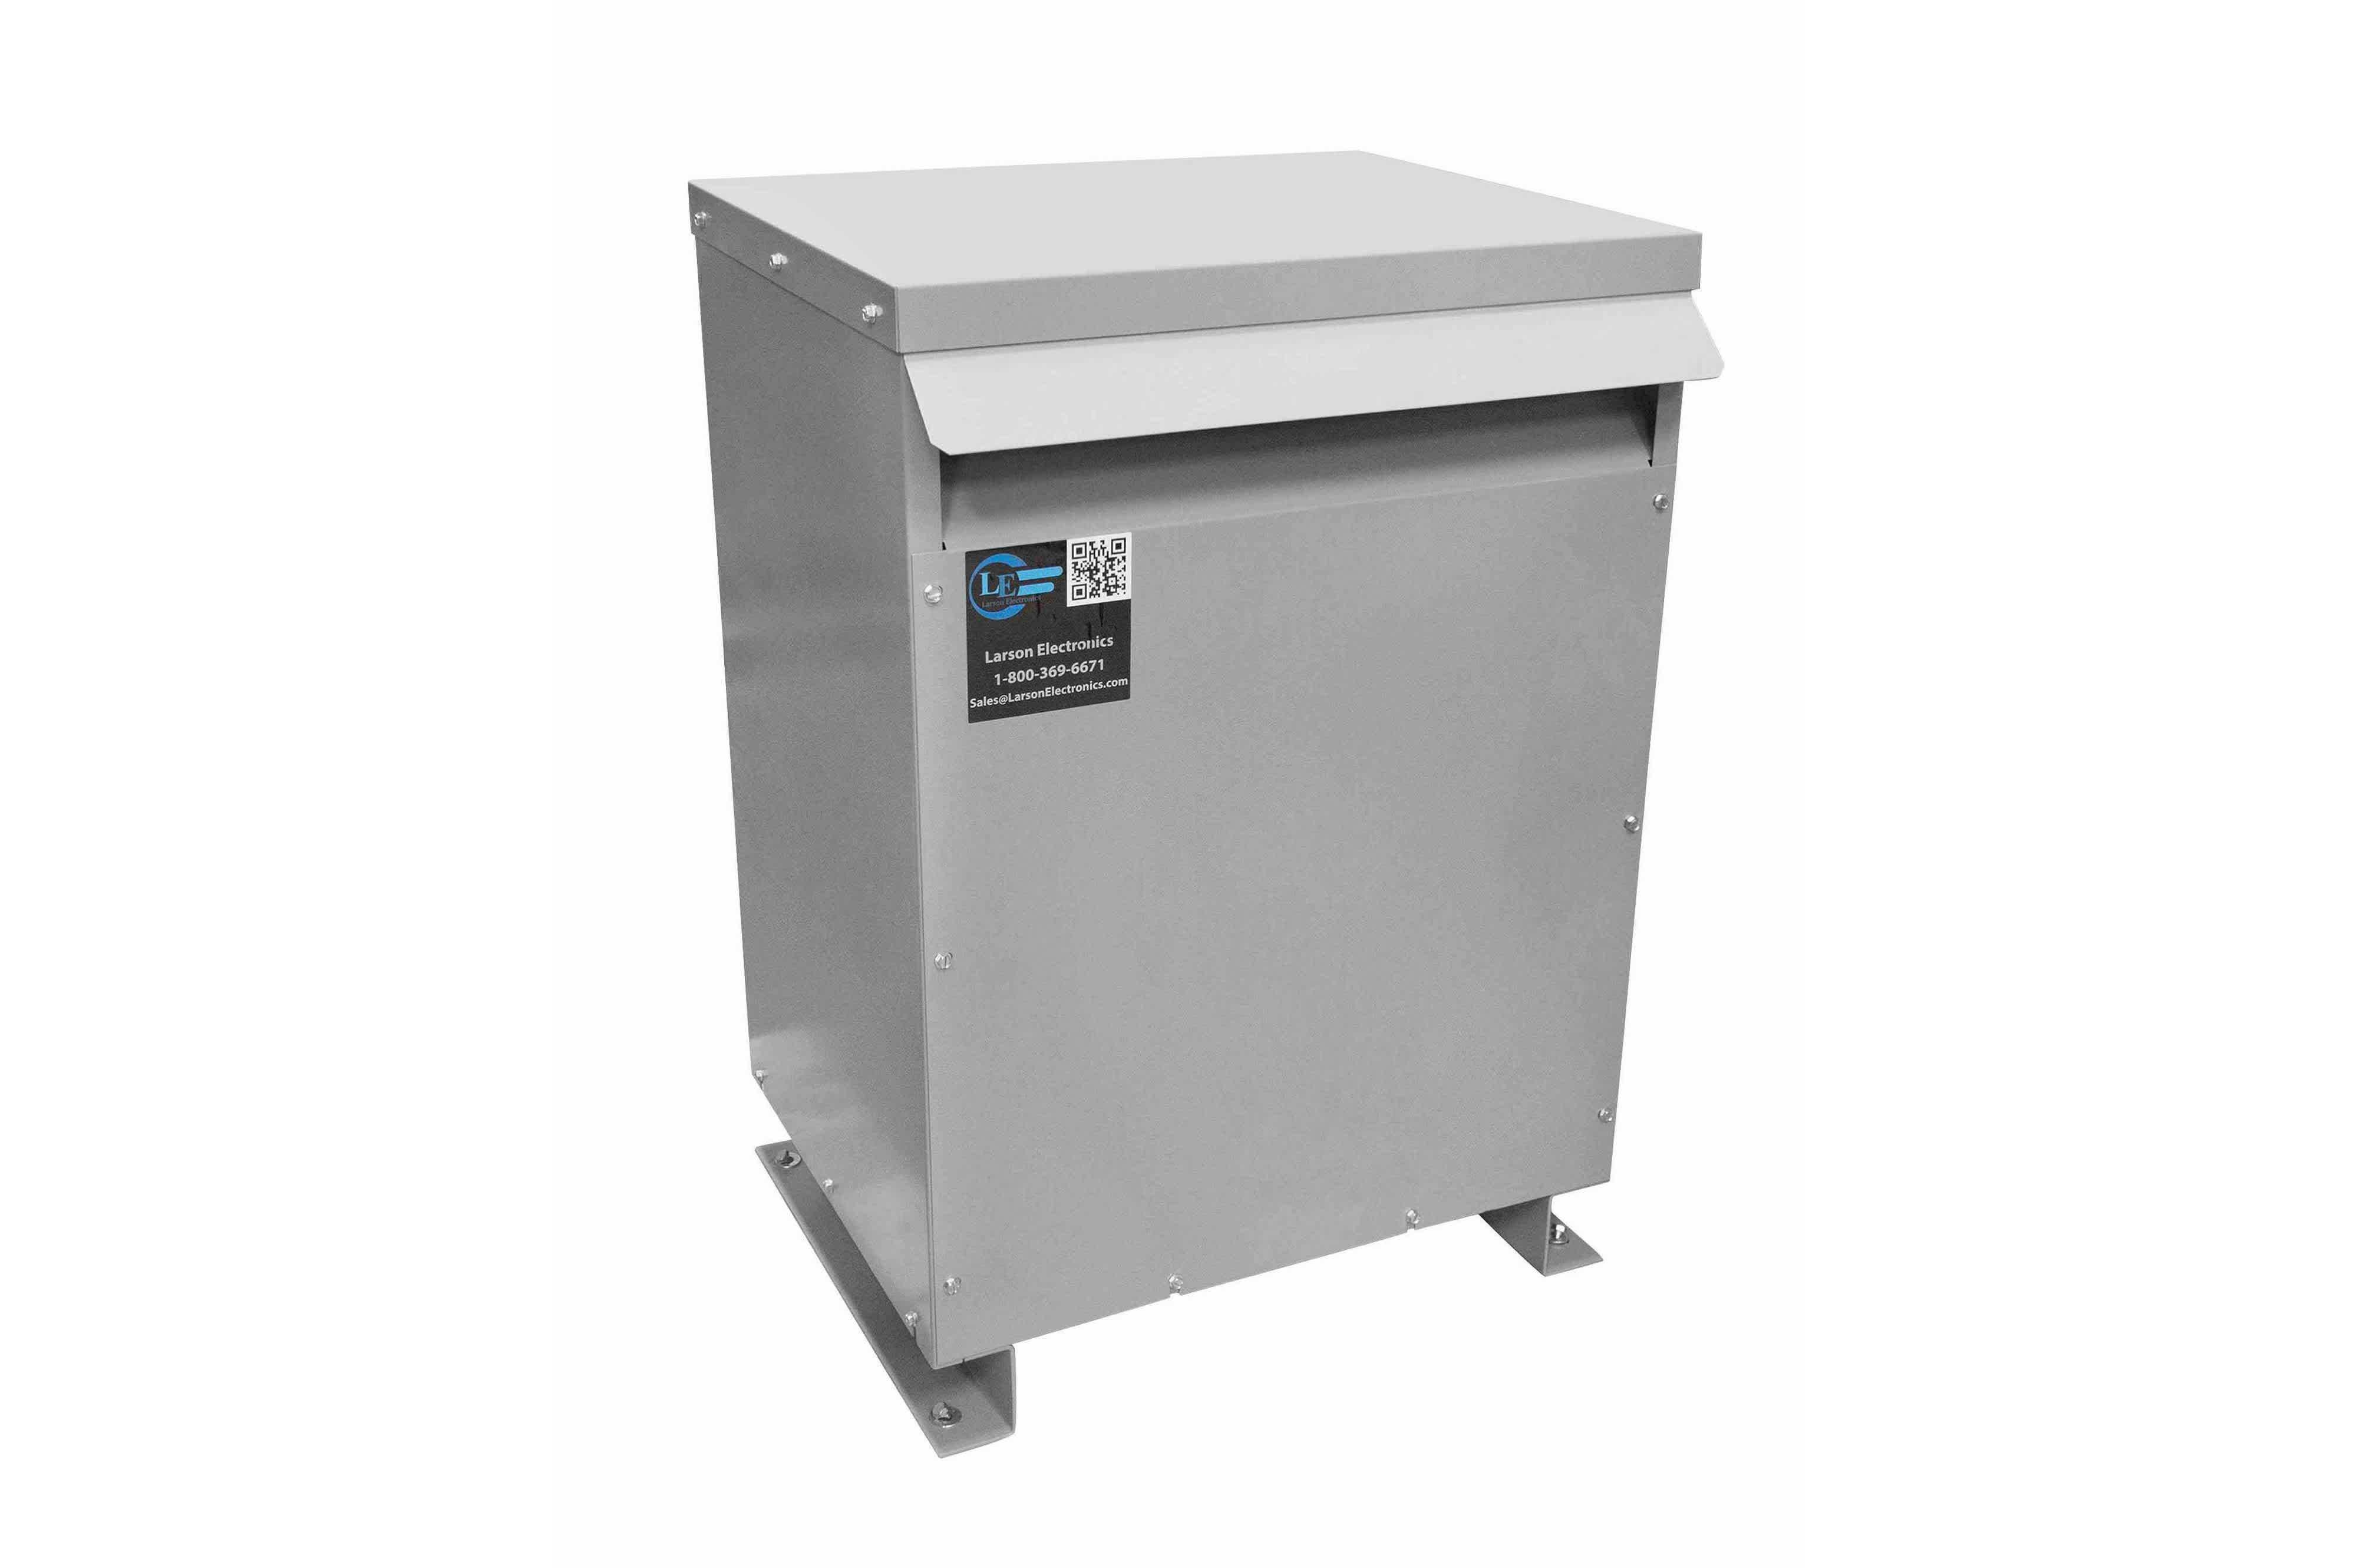 237.5 kVA 3PH Isolation Transformer, 600V Wye Primary, 380V Delta Secondary, N3R, Ventilated, 60 Hz